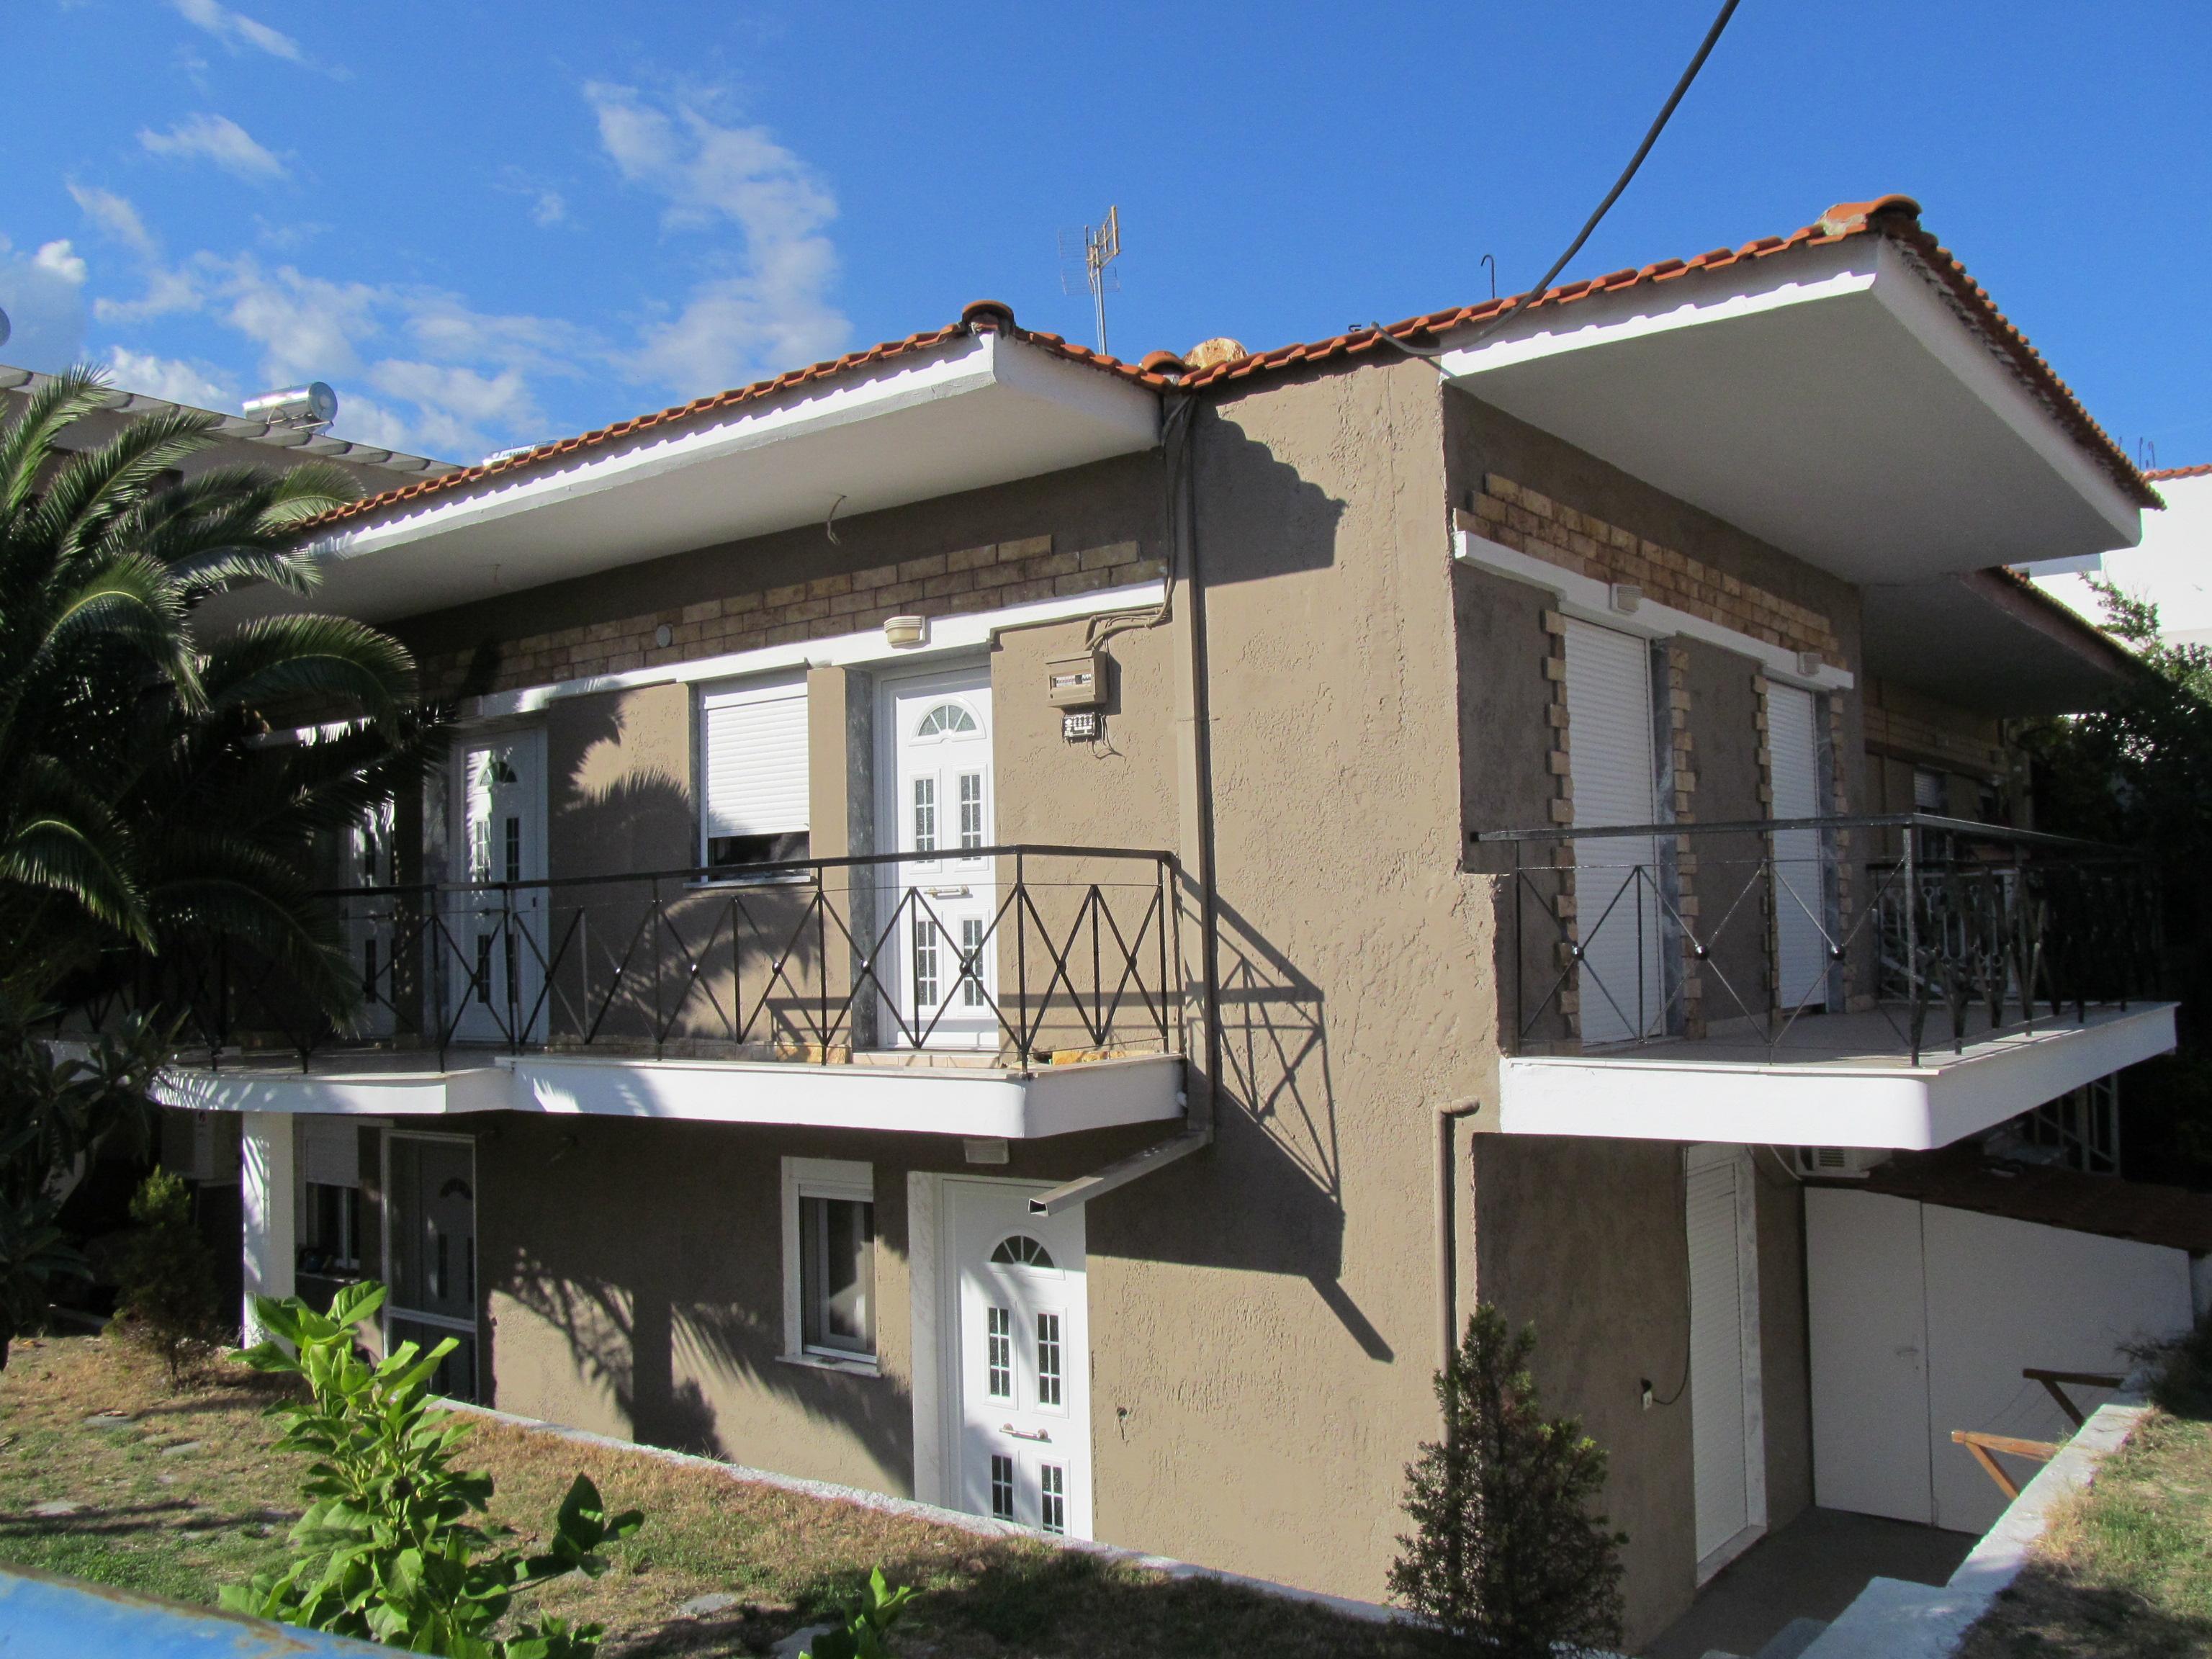 Vila Marianti Sarti, Letovanje, Grcka, Kuca, Komentari, Iskustva, Turisticka Agencija, Oniro Travel